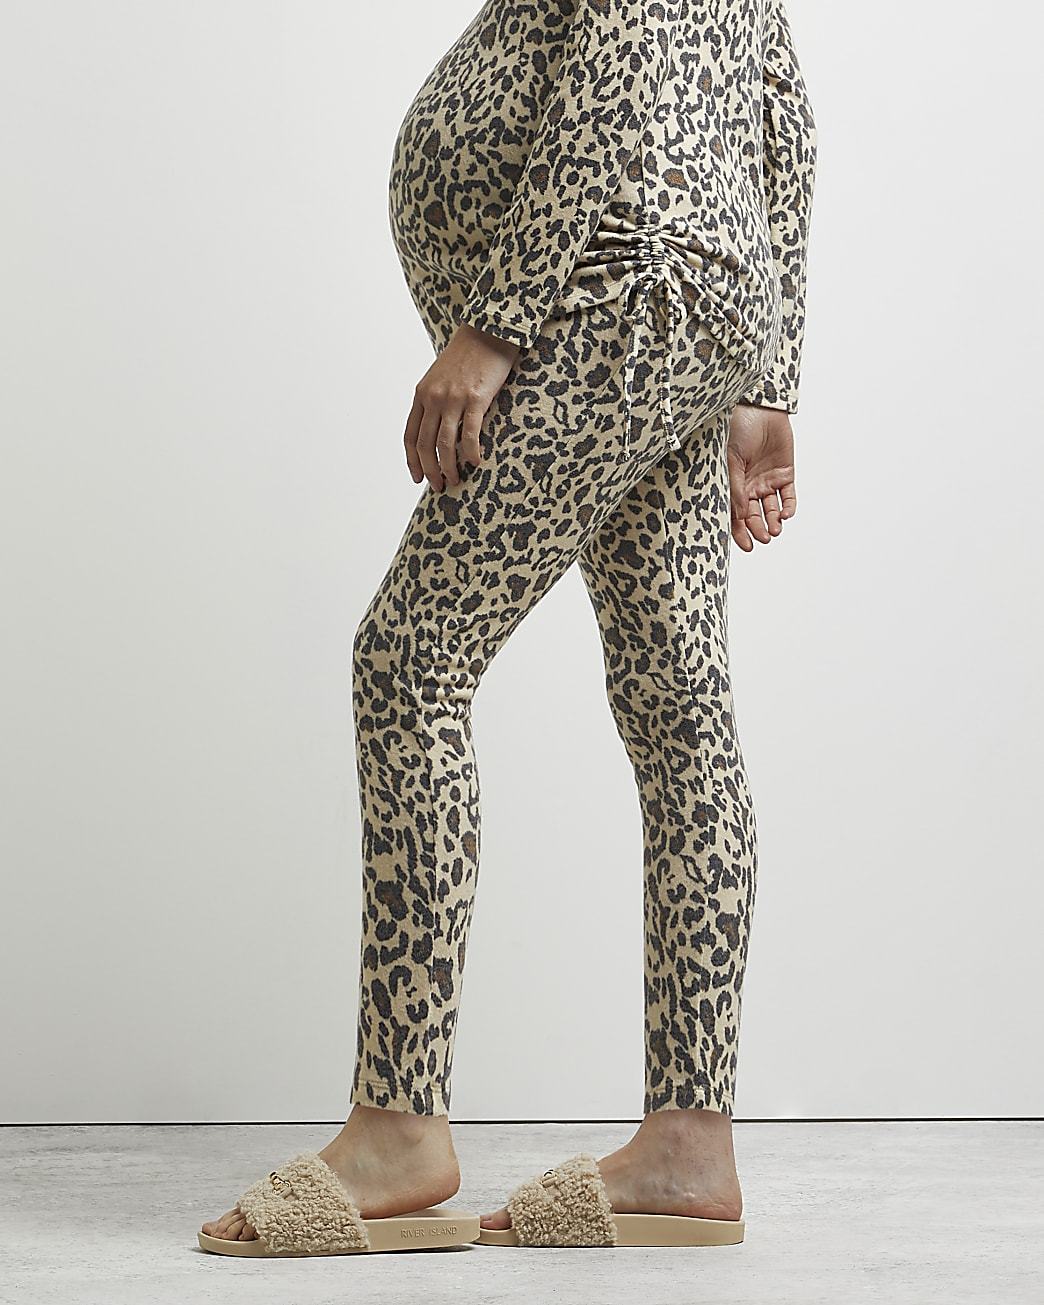 Beige animal print maternity leggings